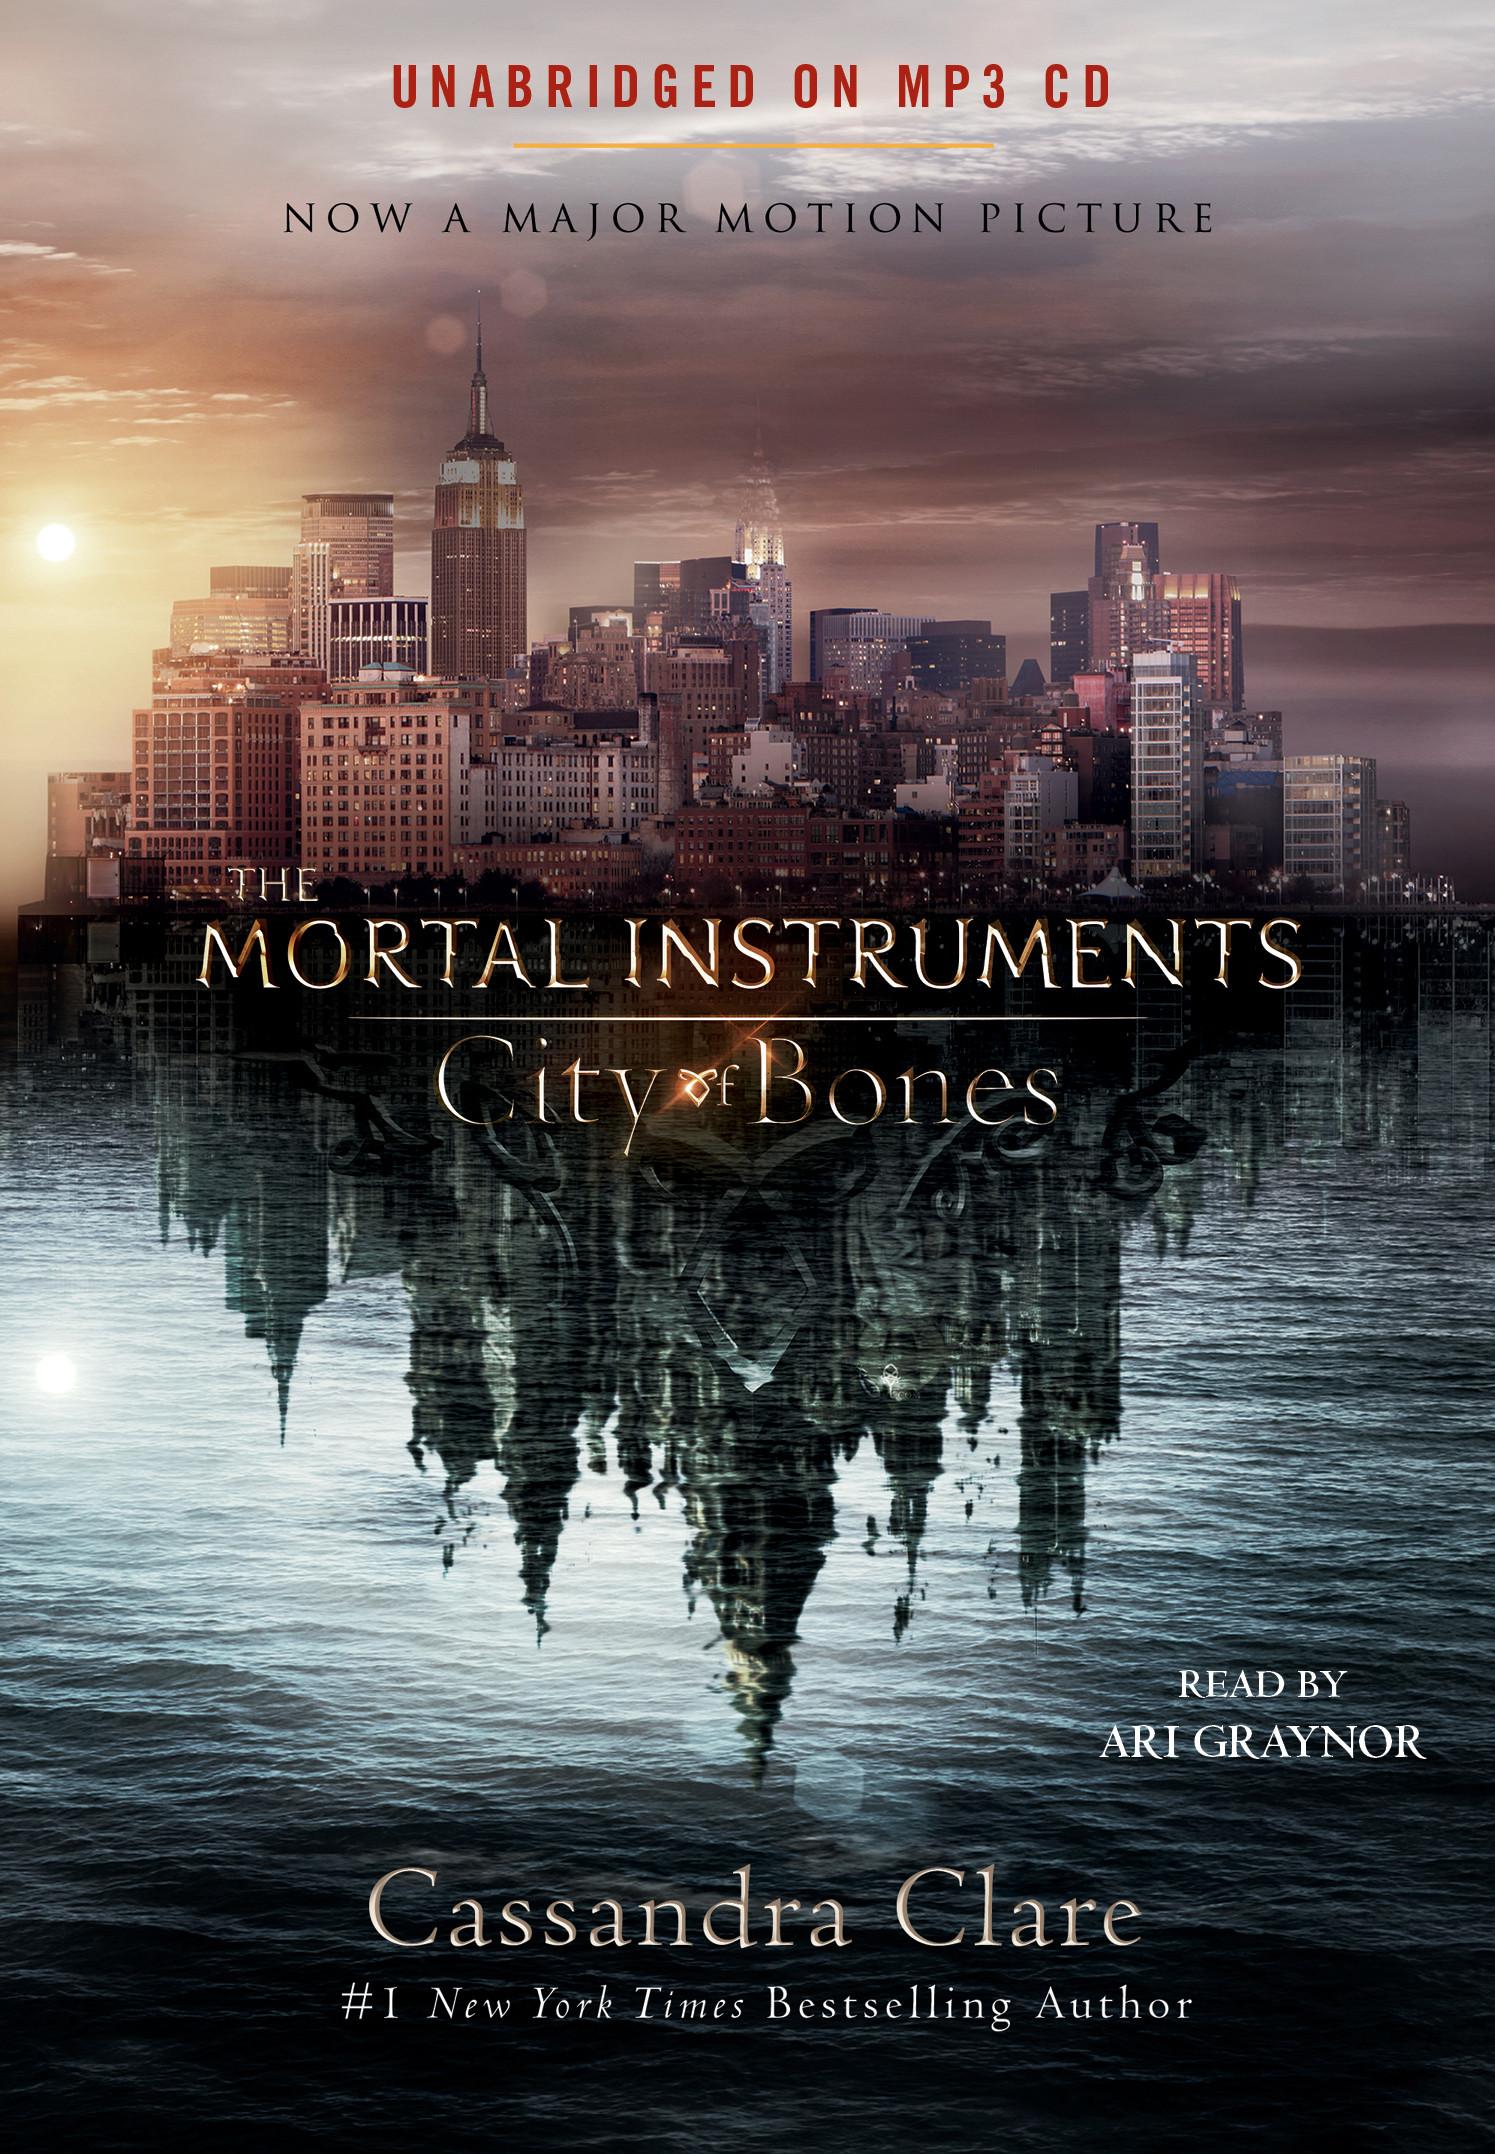 Book Cover Image (jpg): City of Bones